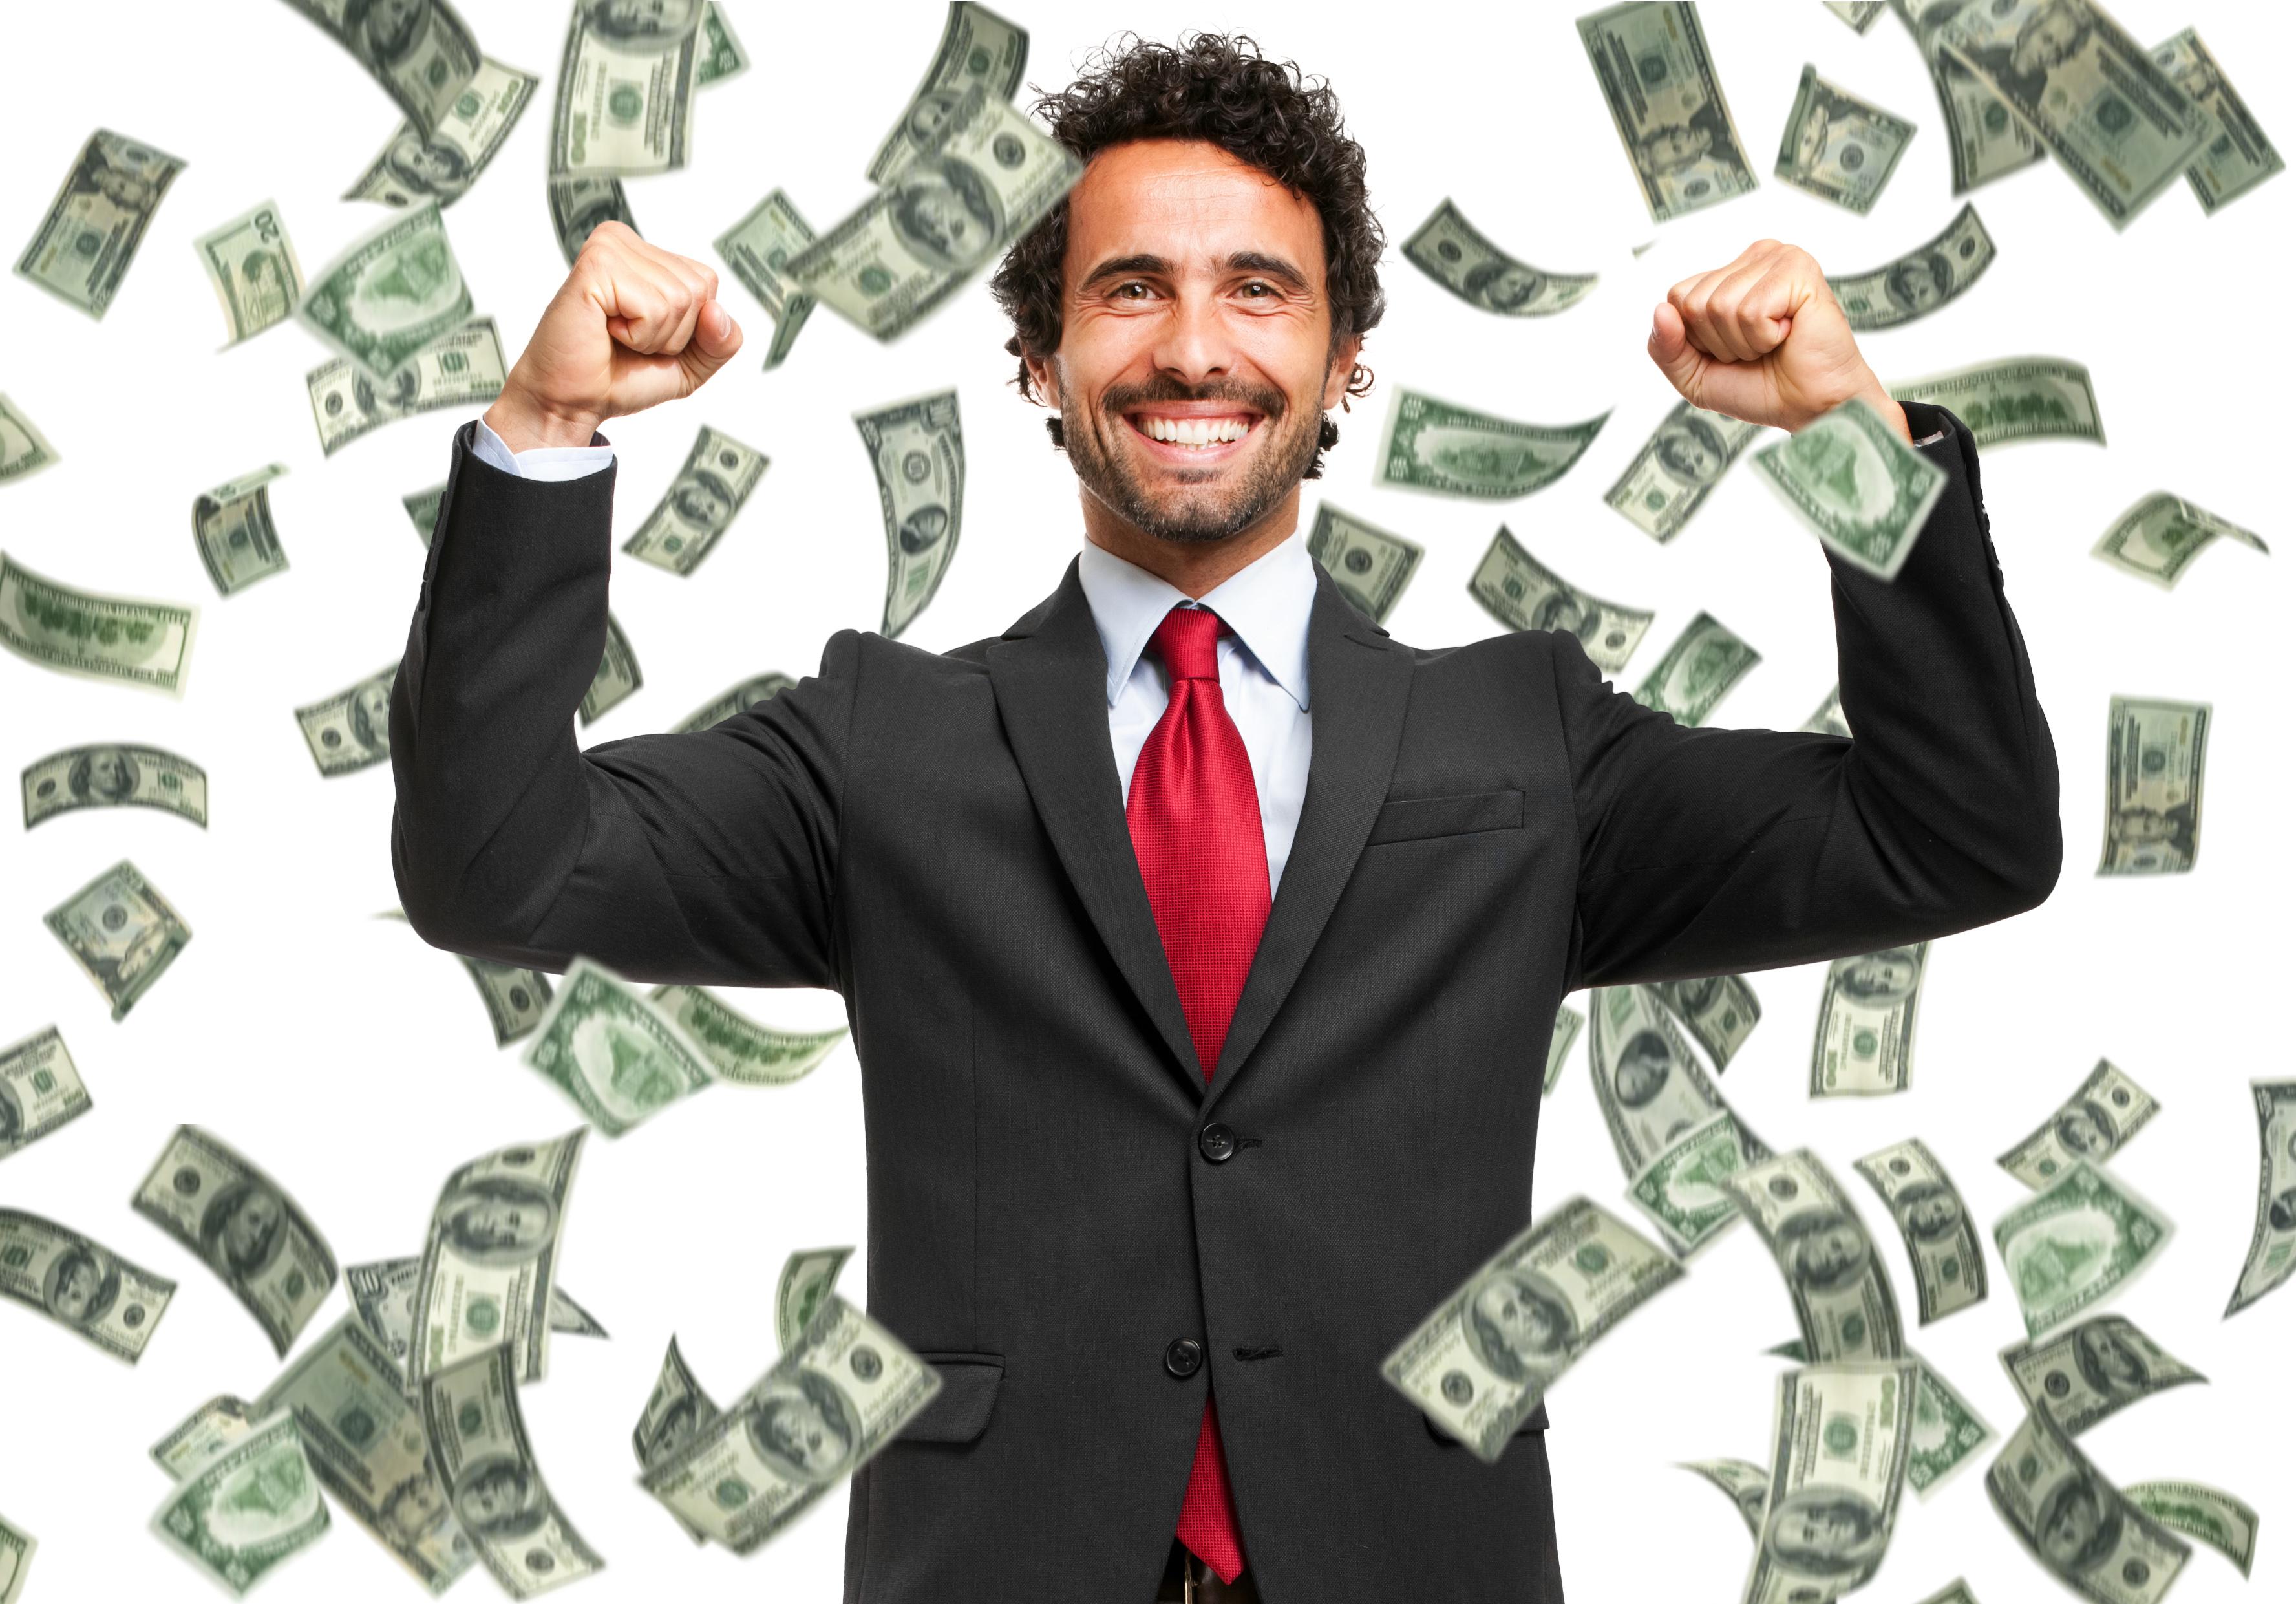 Cash falling on a smiling man.